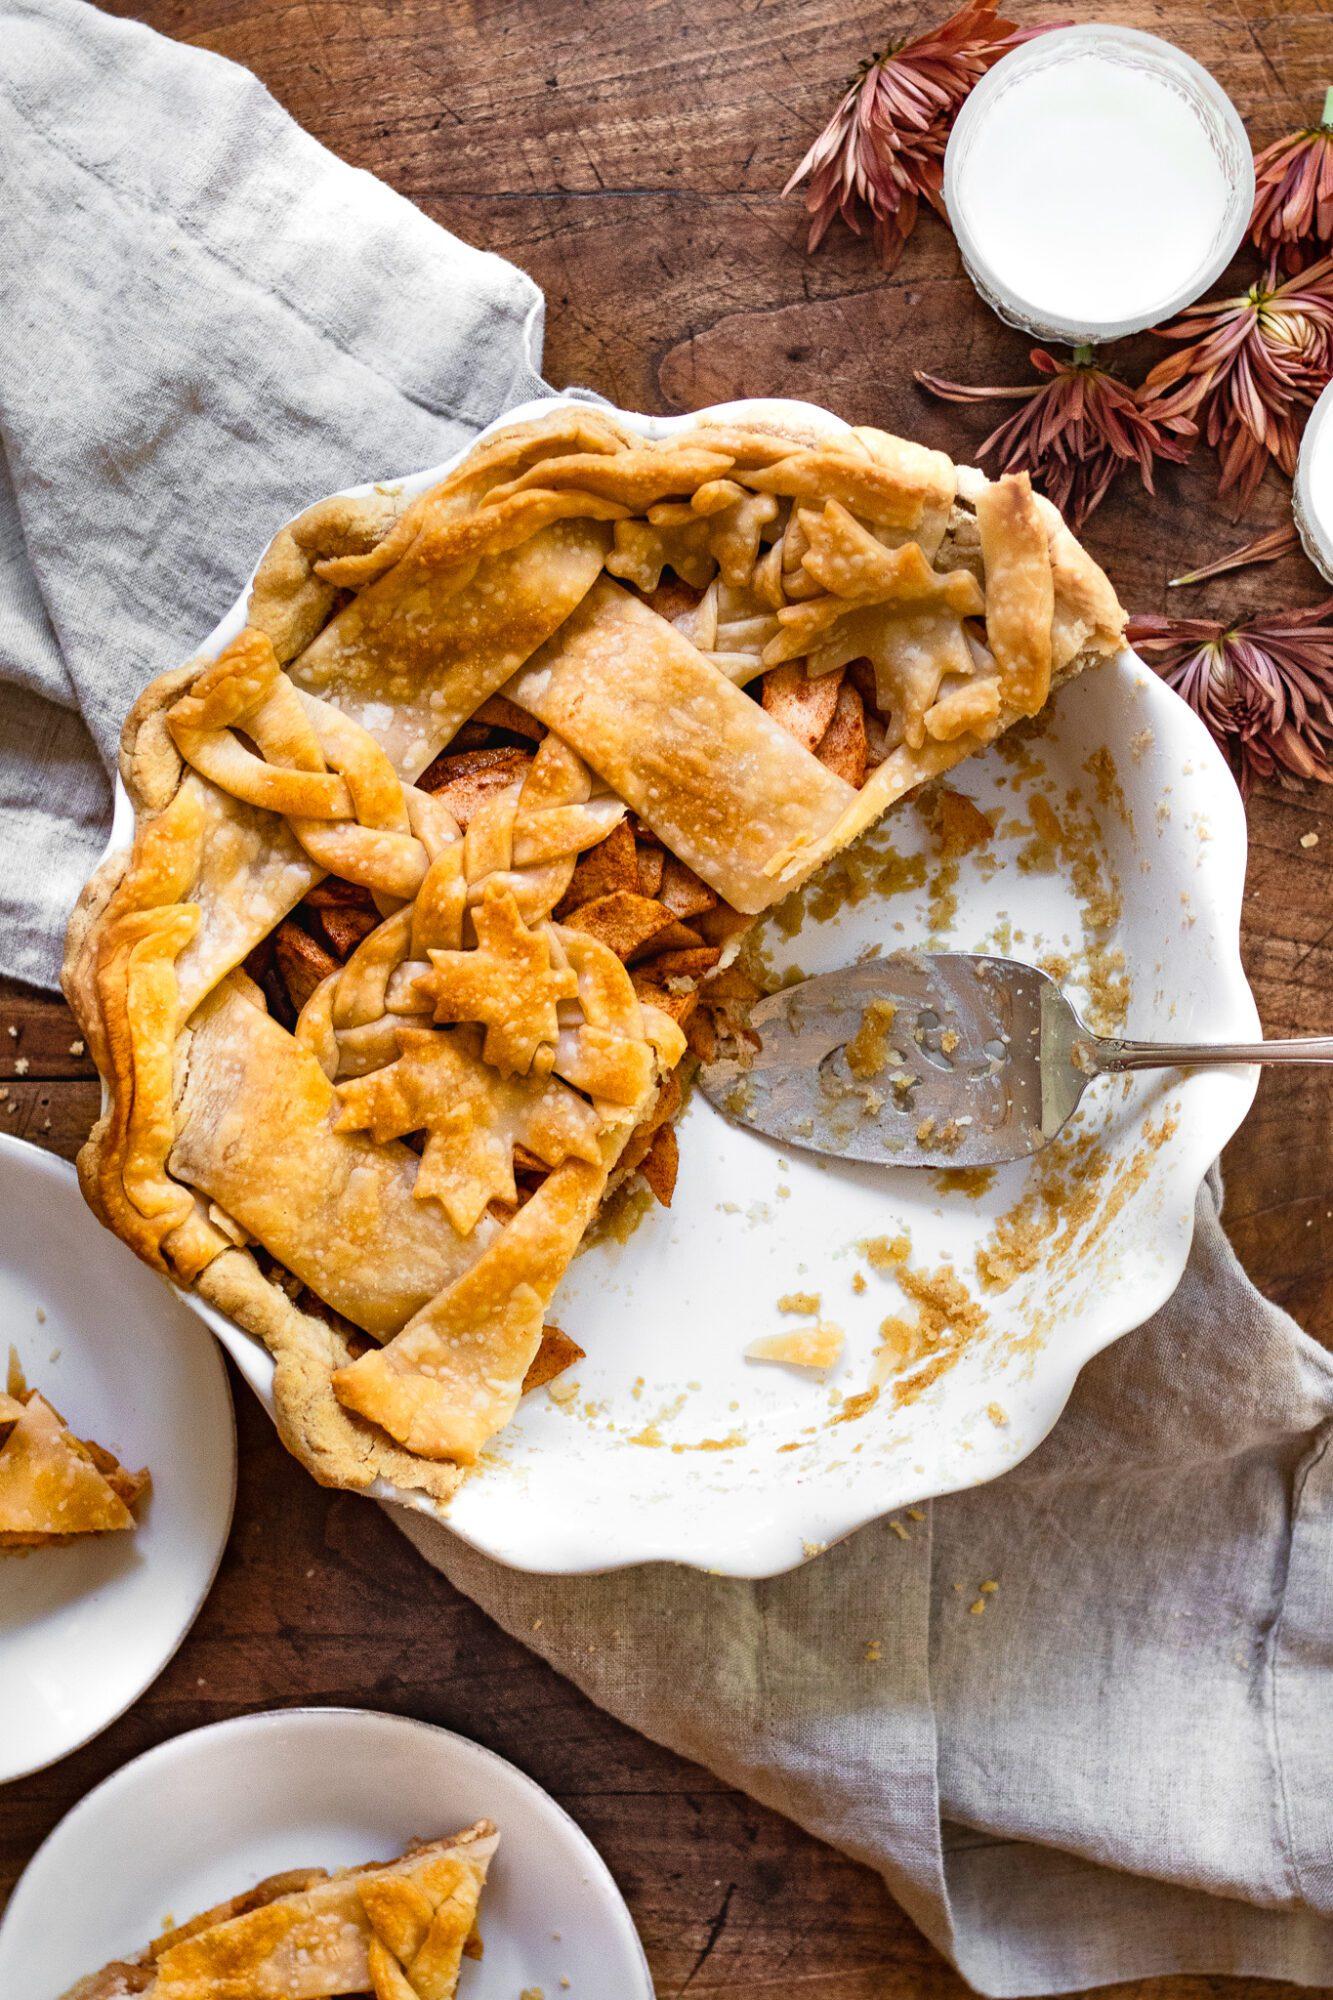 apple pie being eaten